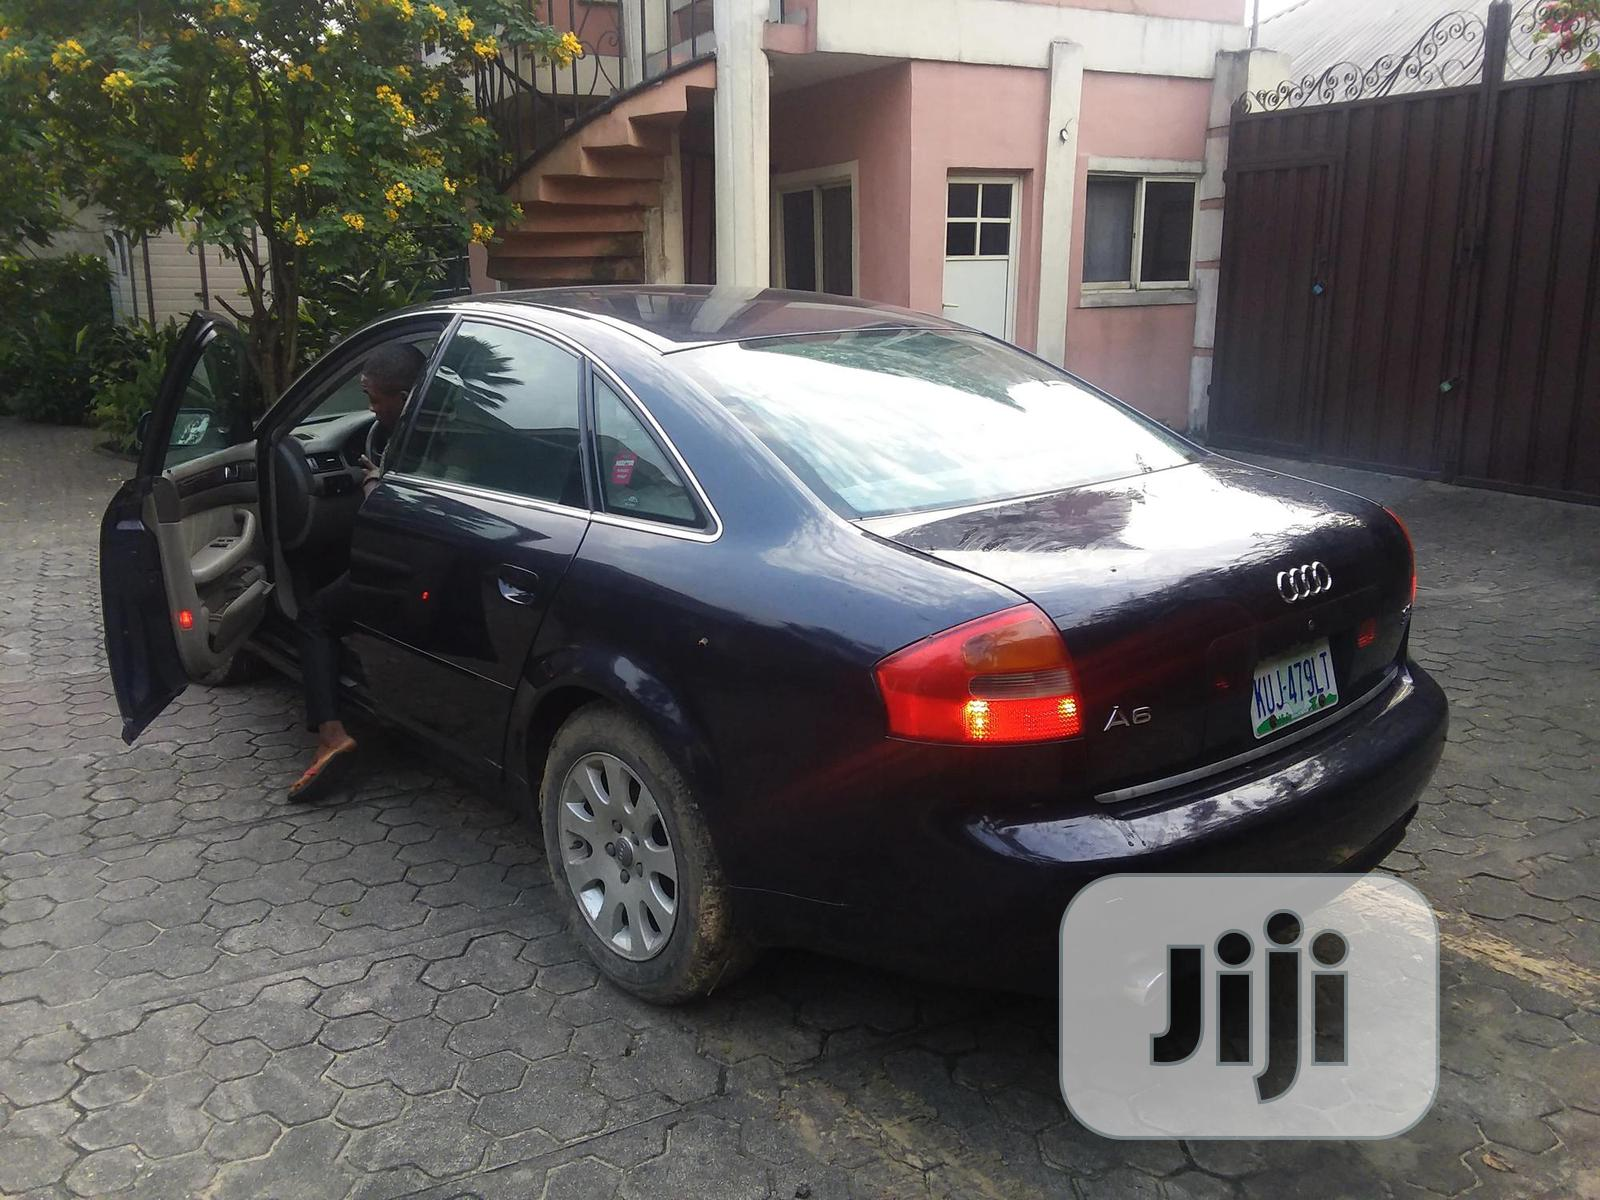 Archive: Audi A6 2001 3.0 CVT Blue